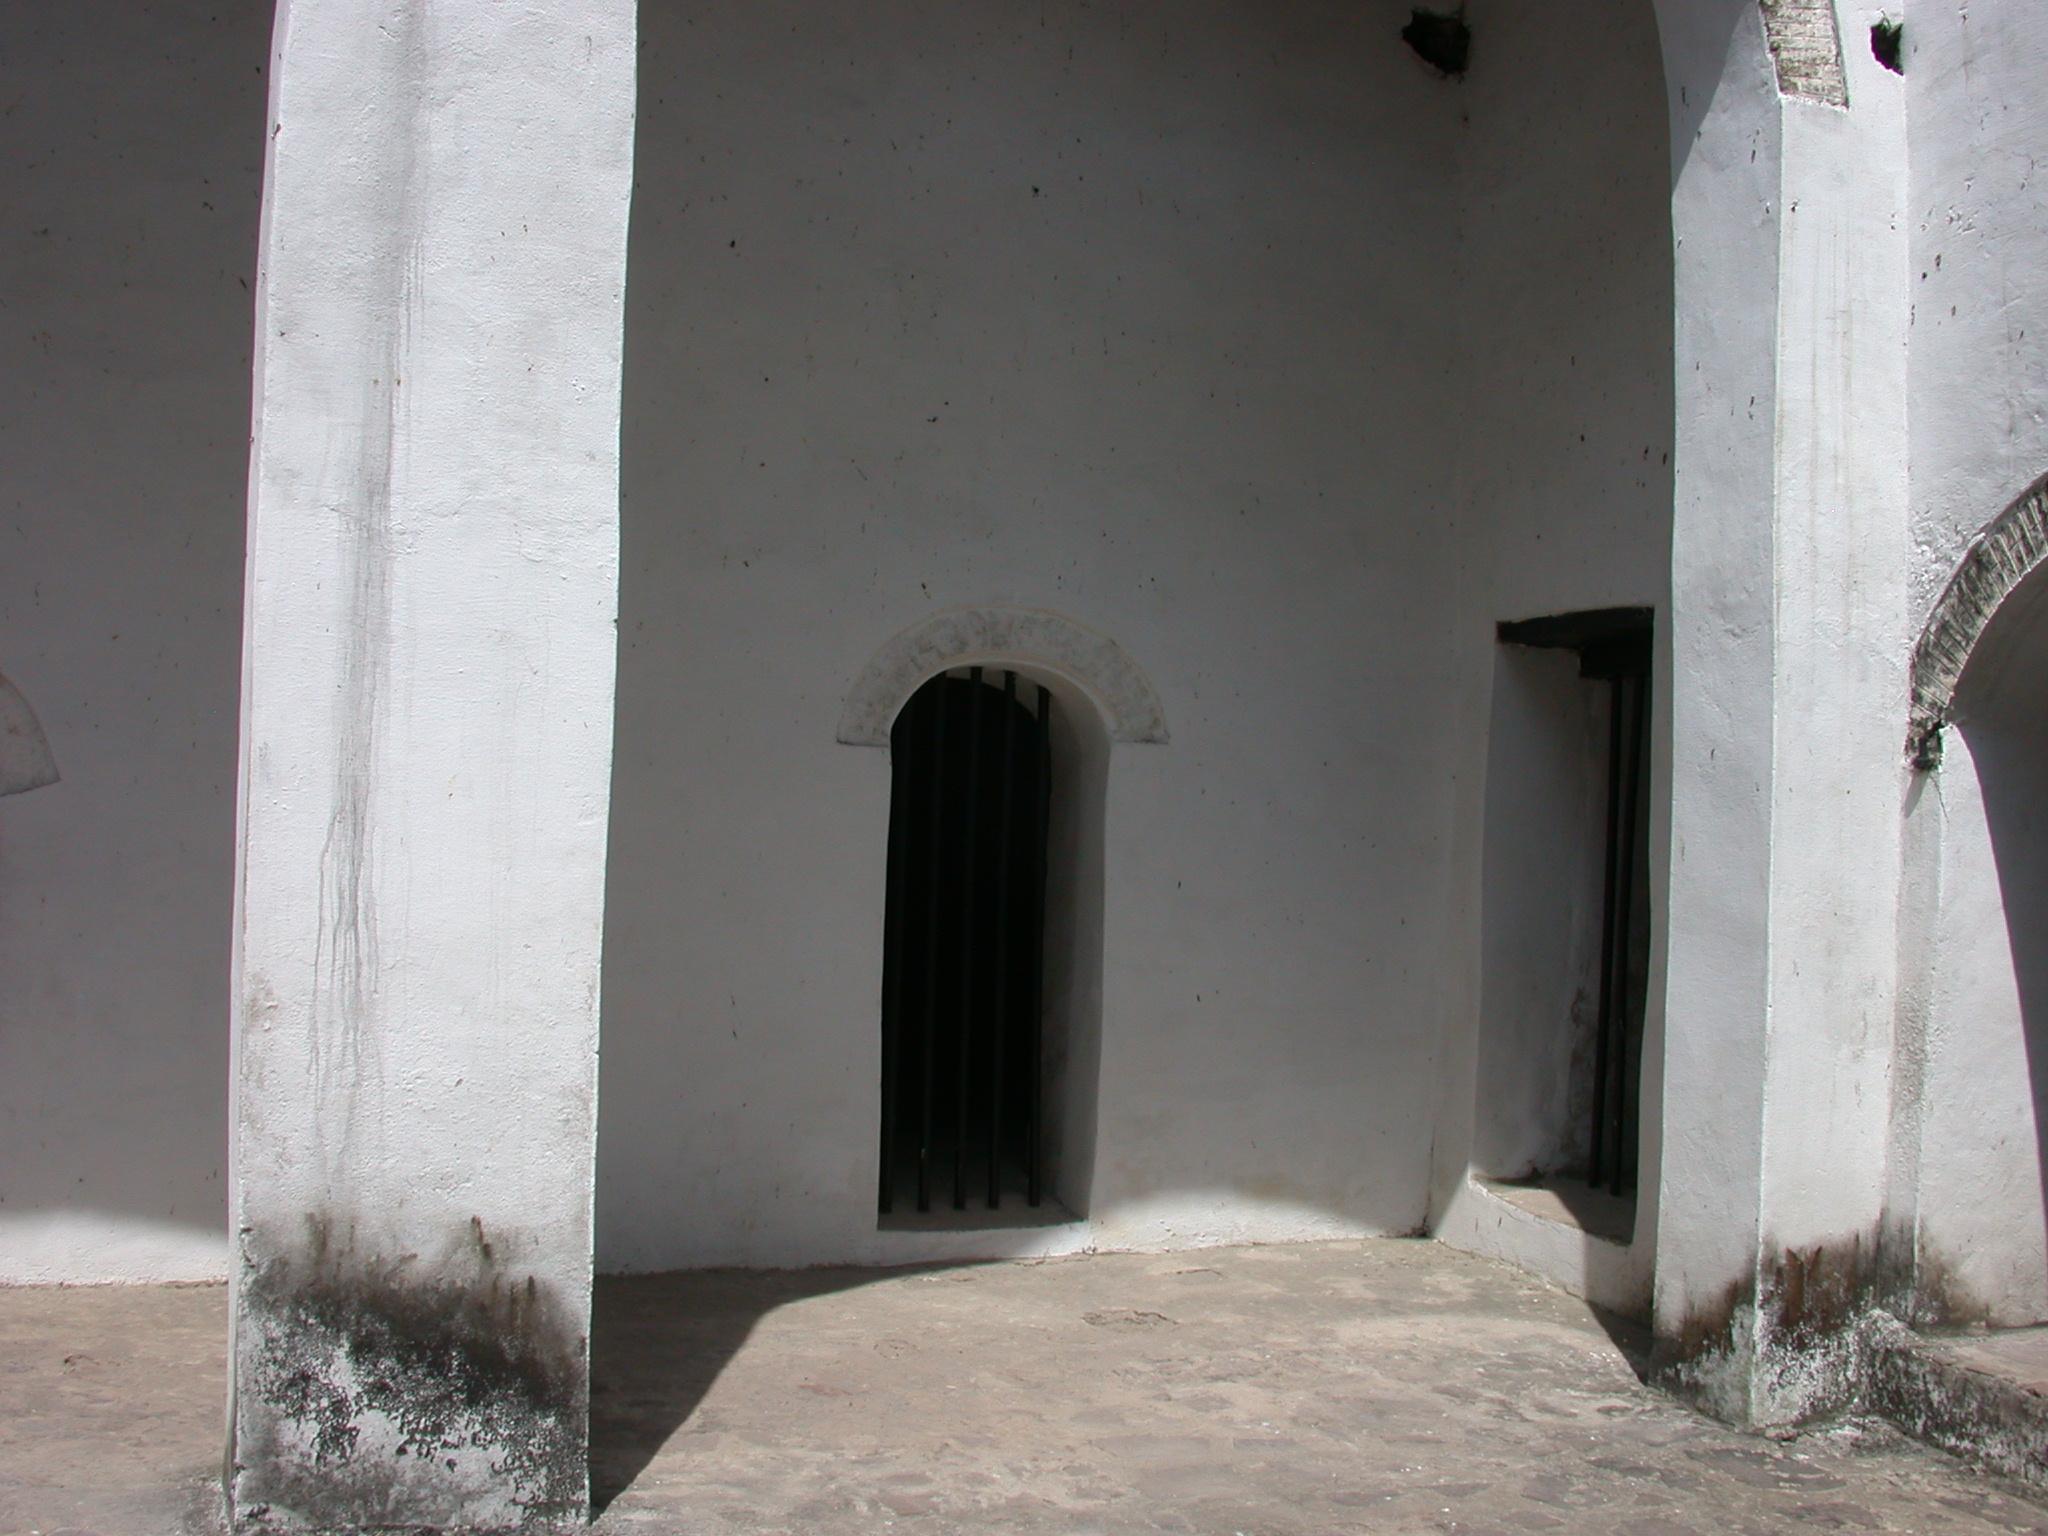 Barred Doors Visible From Courtyard, Elmina Slave Fort, Elmina, Ghana